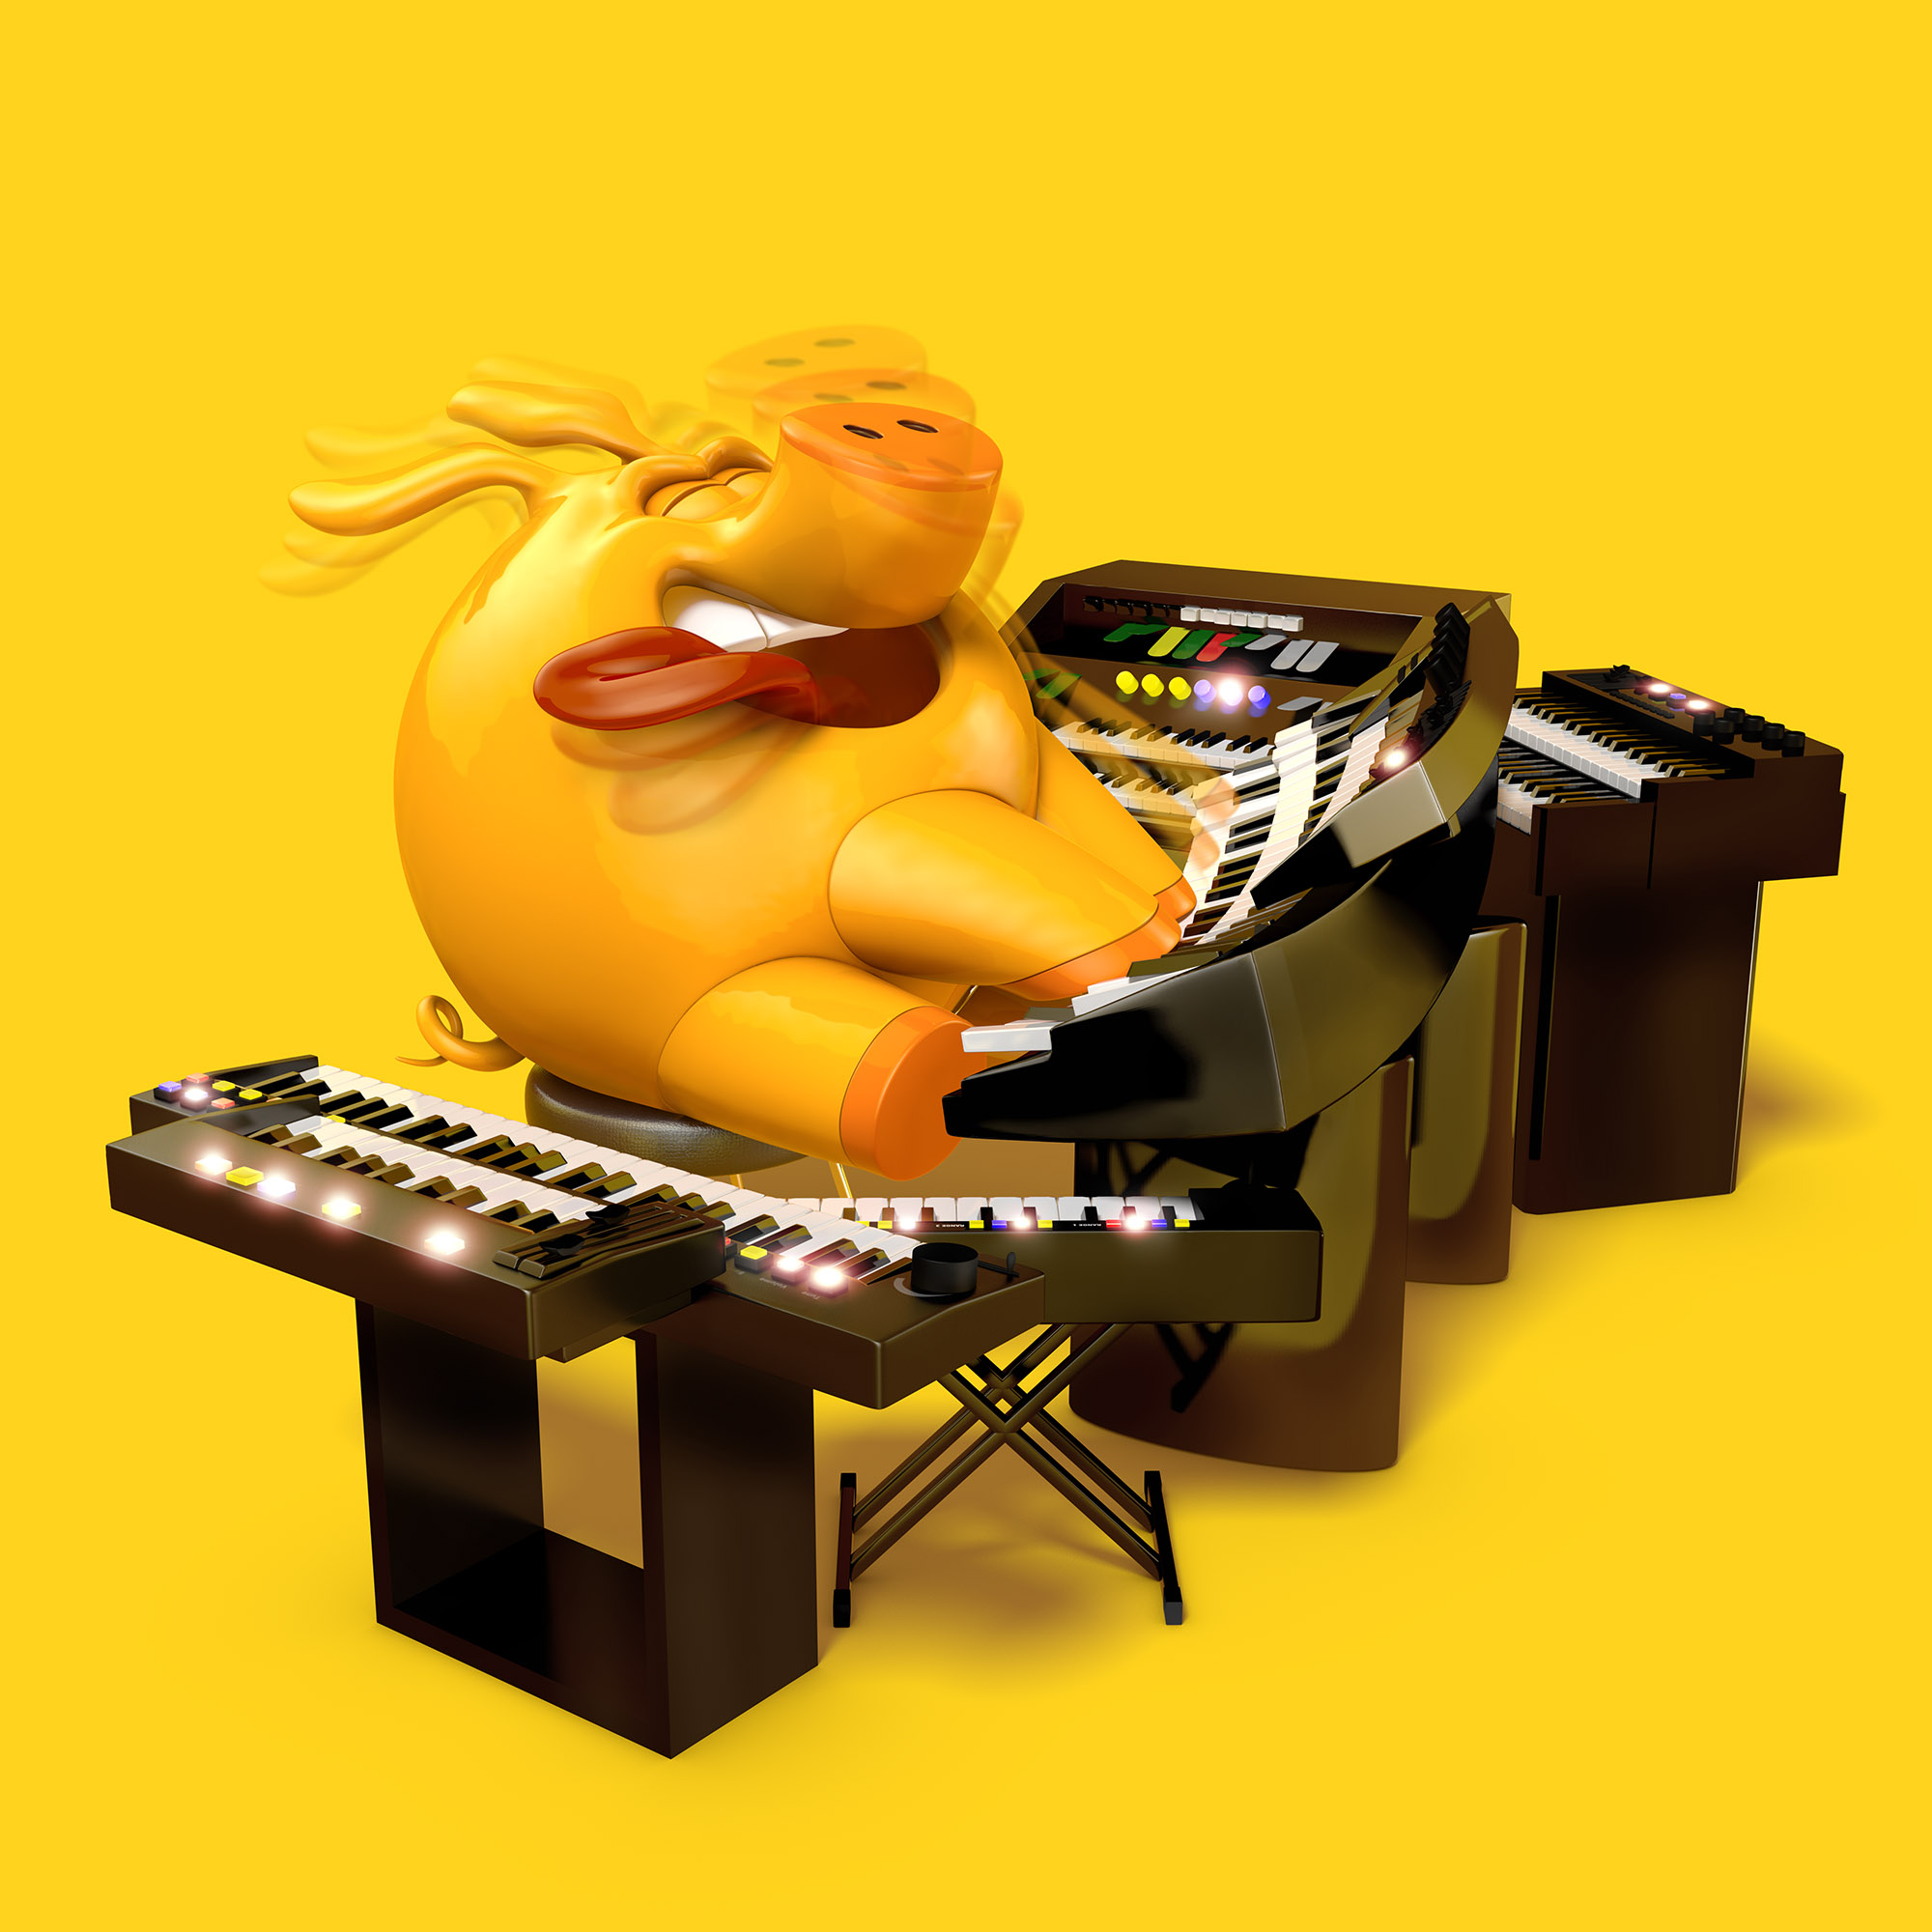 patrickgraf_Miggy_keyboard04.jpg